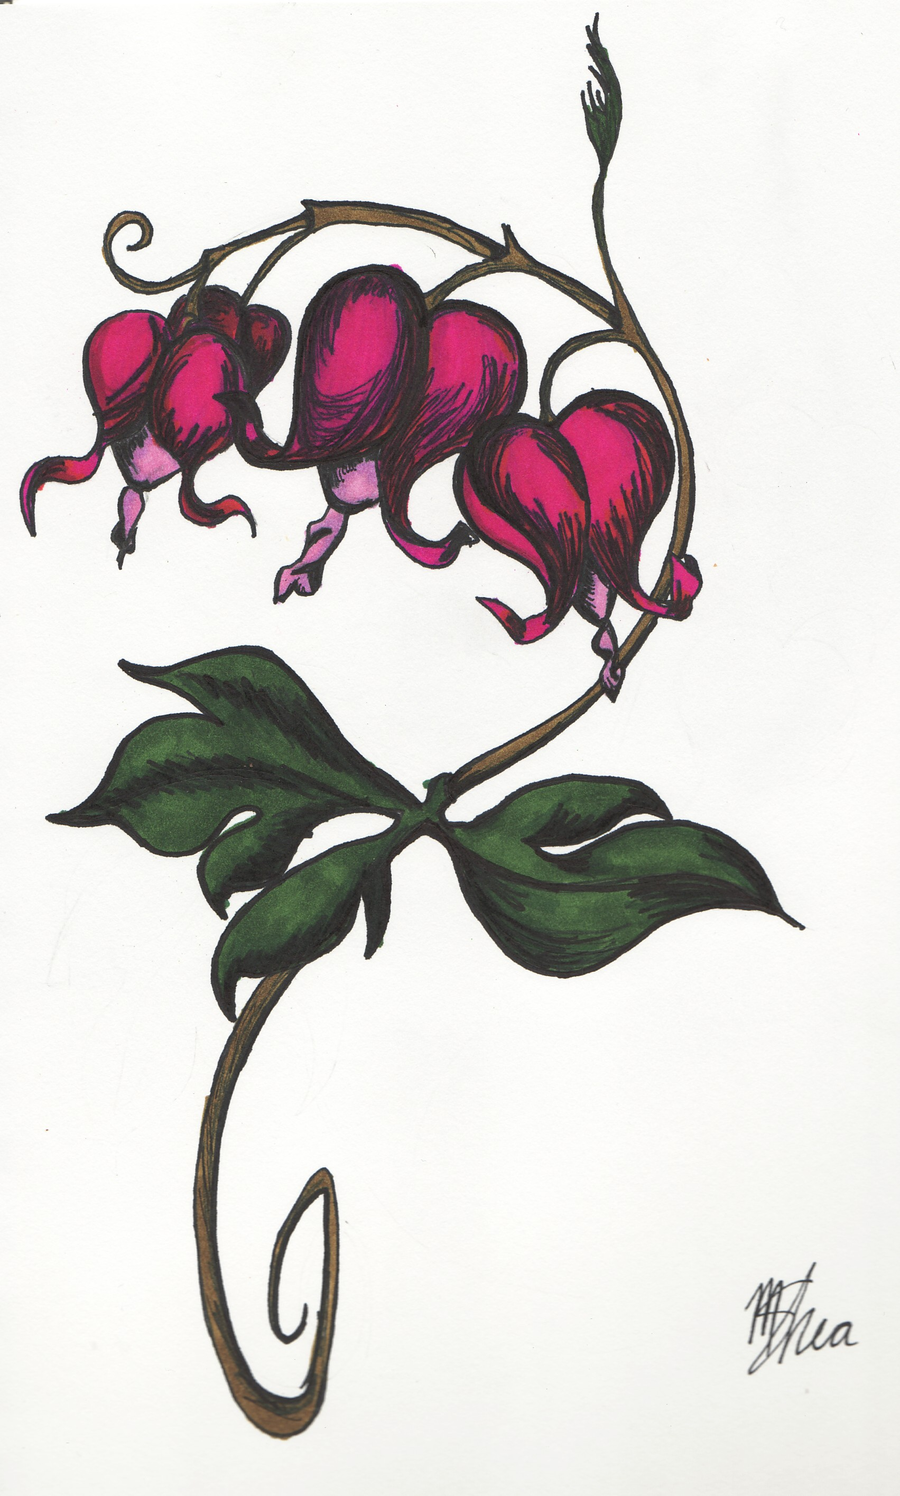 Bleeding+Heart+Flowers Heart flower tattoo, Bleeding